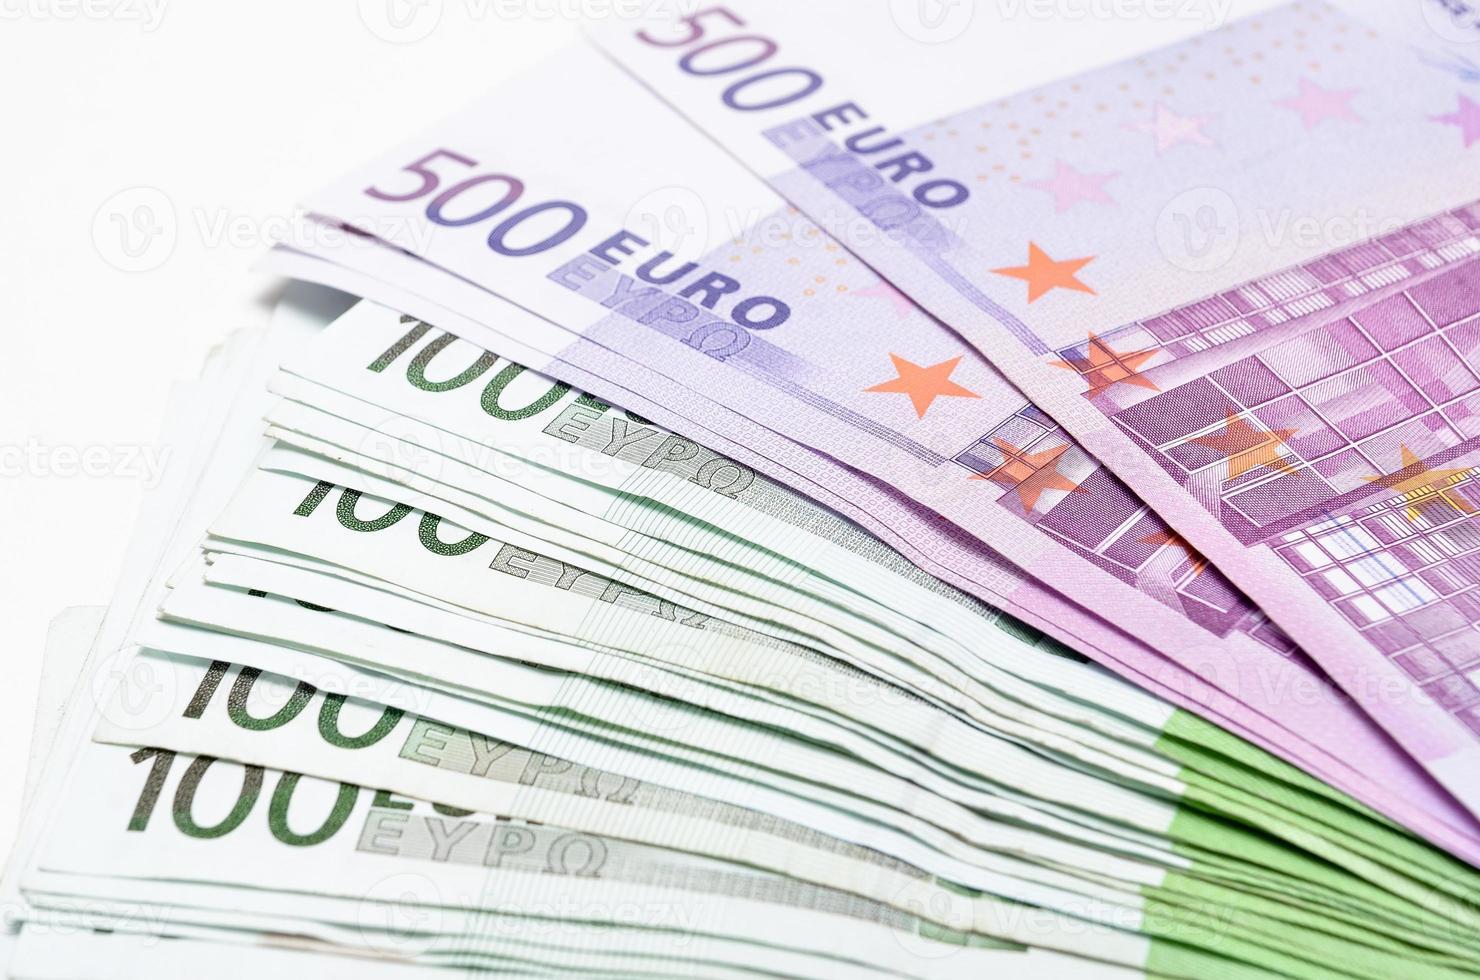 stapel geld eurobiljetten bankbiljetten. euro valuta uit Europa foto